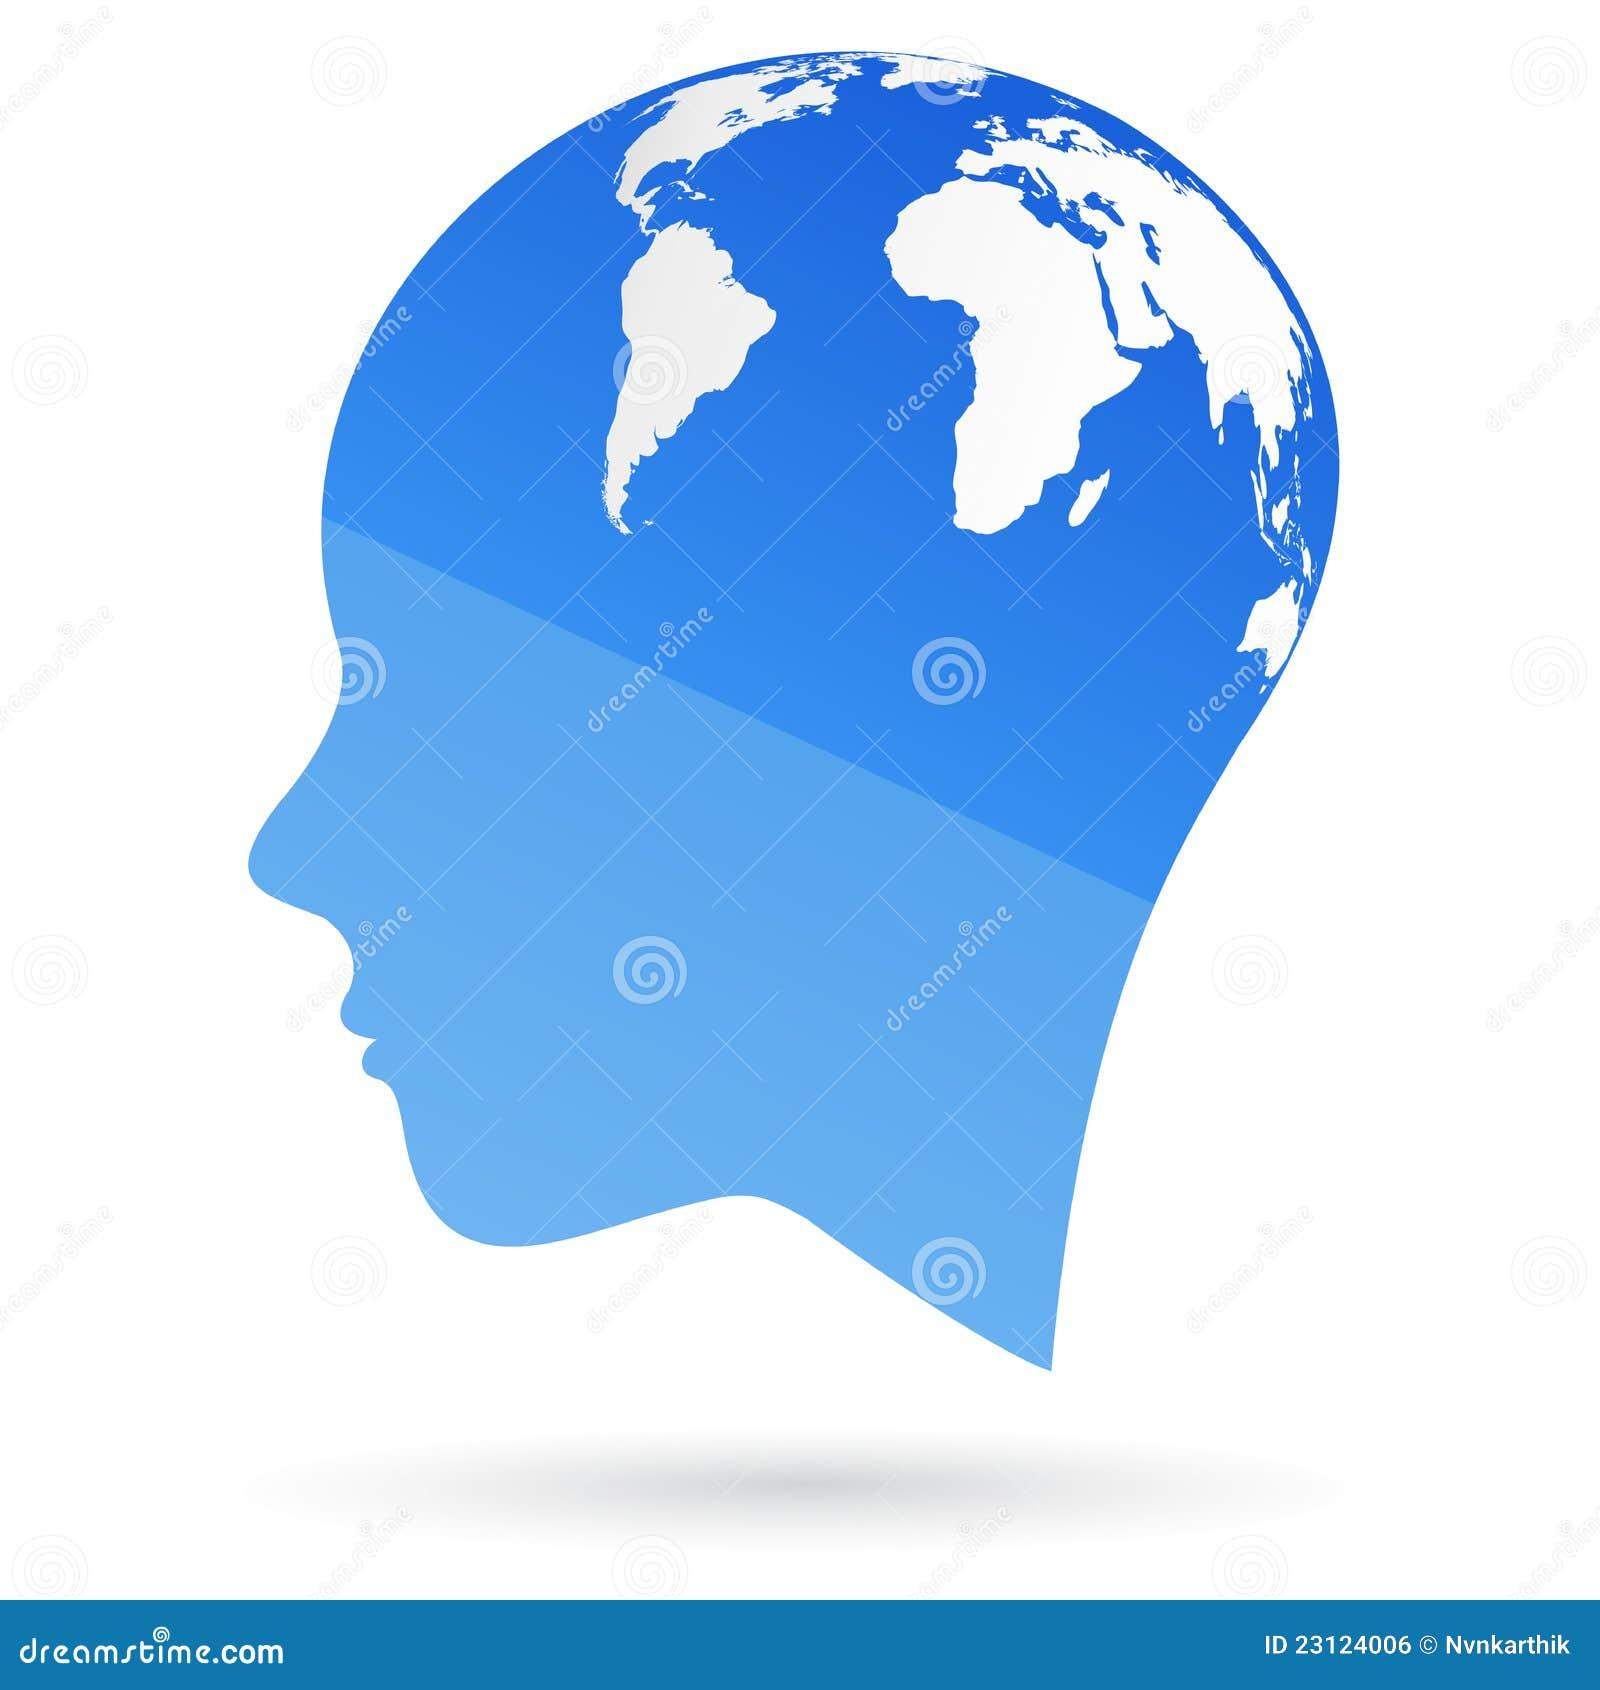 download human resource development the new